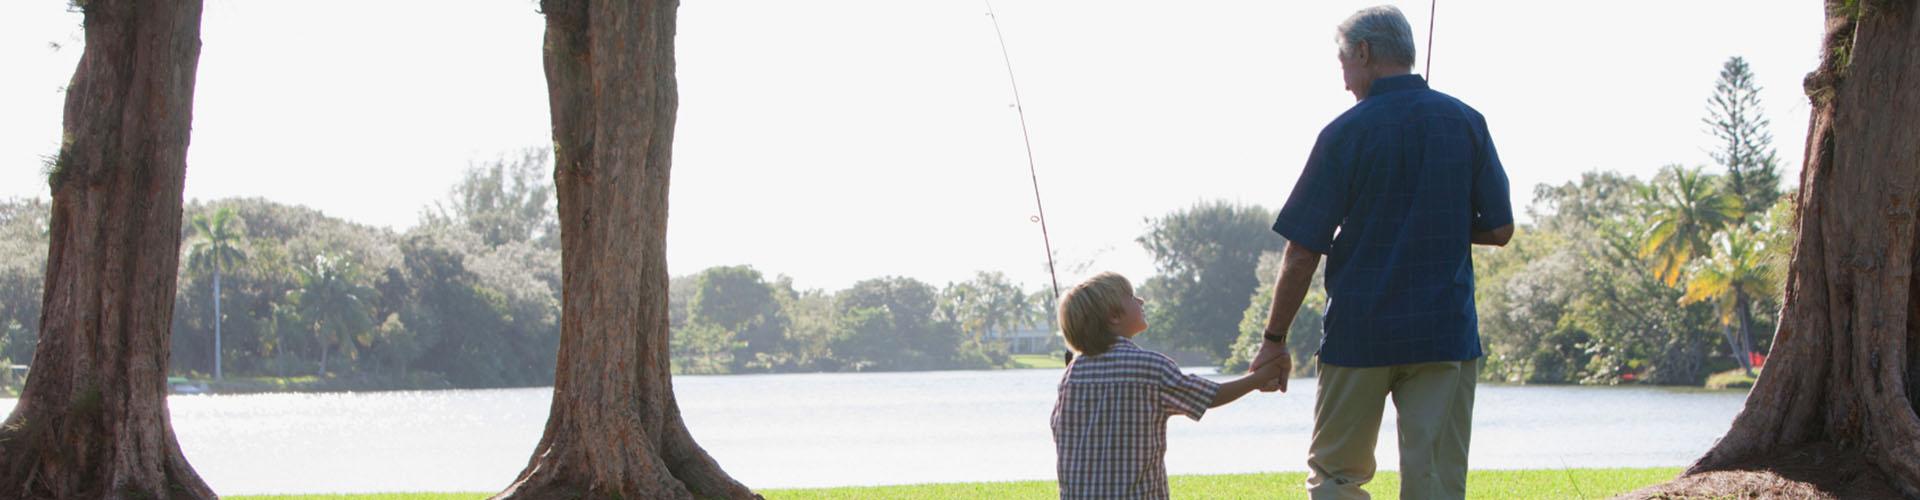 granpa_grandson_fishing